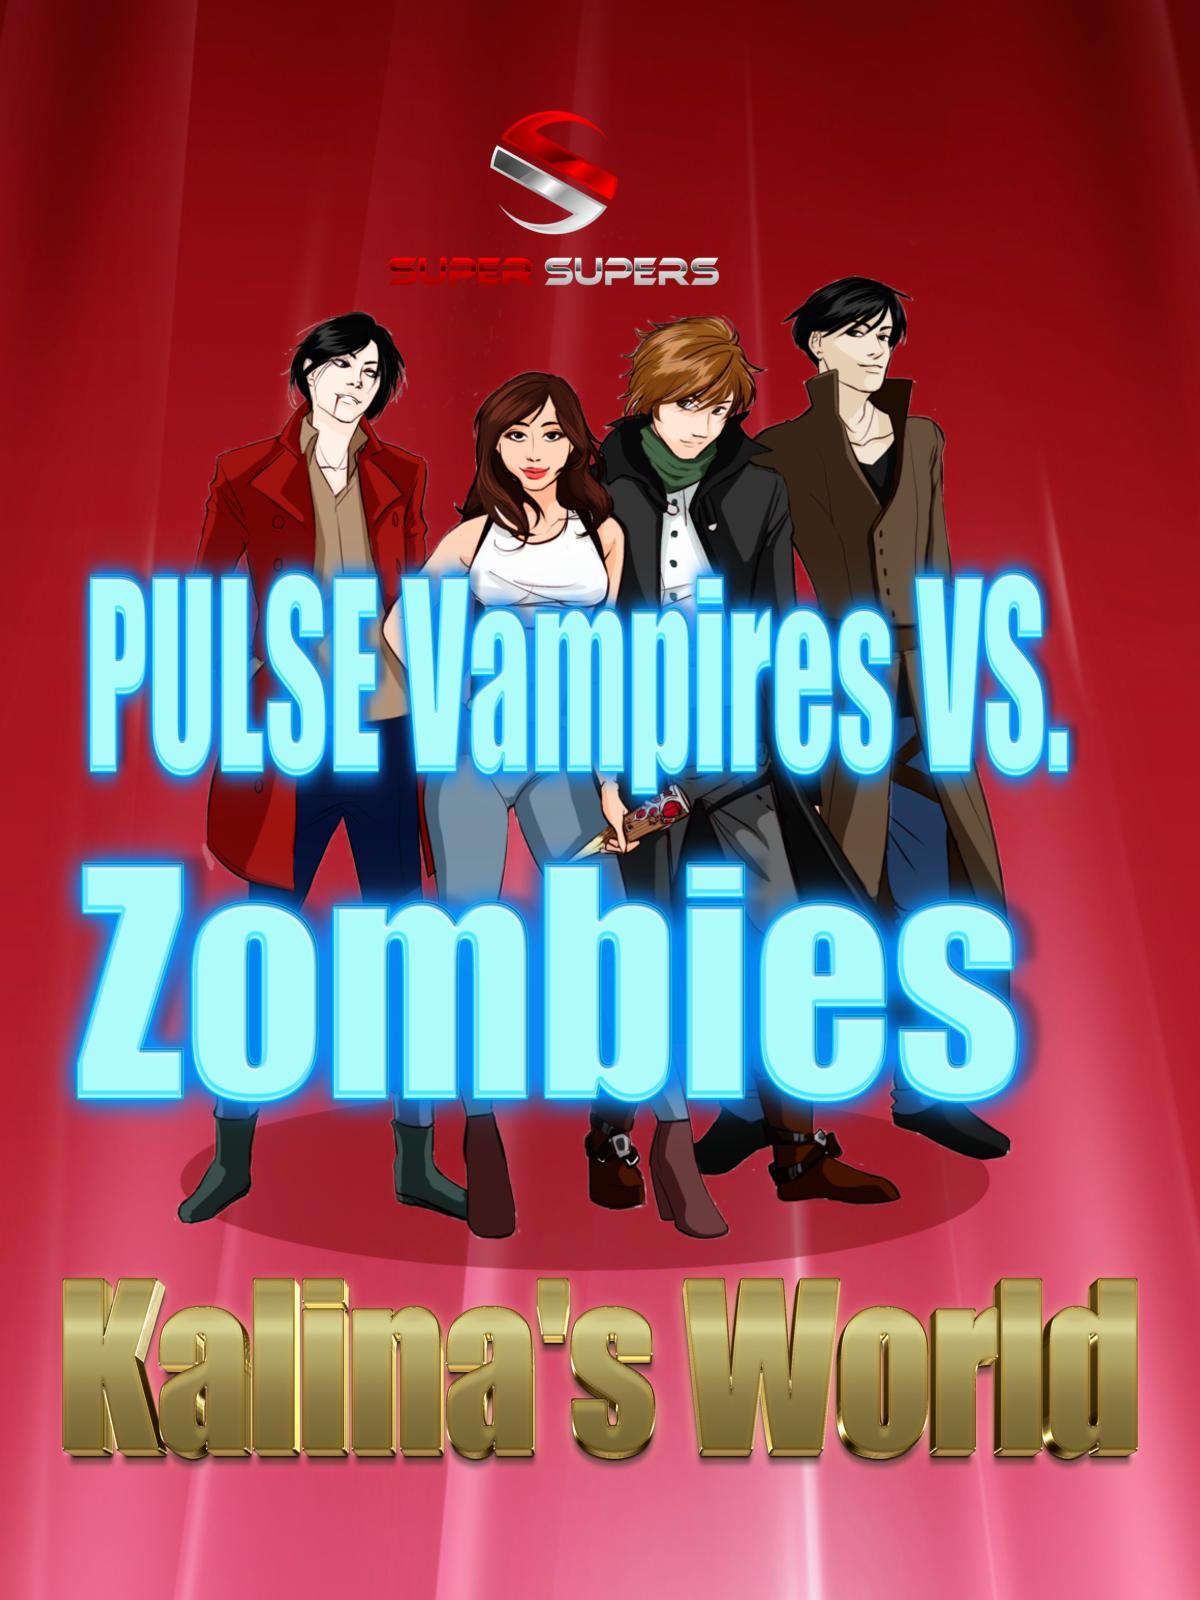 Super Supers: Pulse Vampires VS. Zombies - Kalina's World